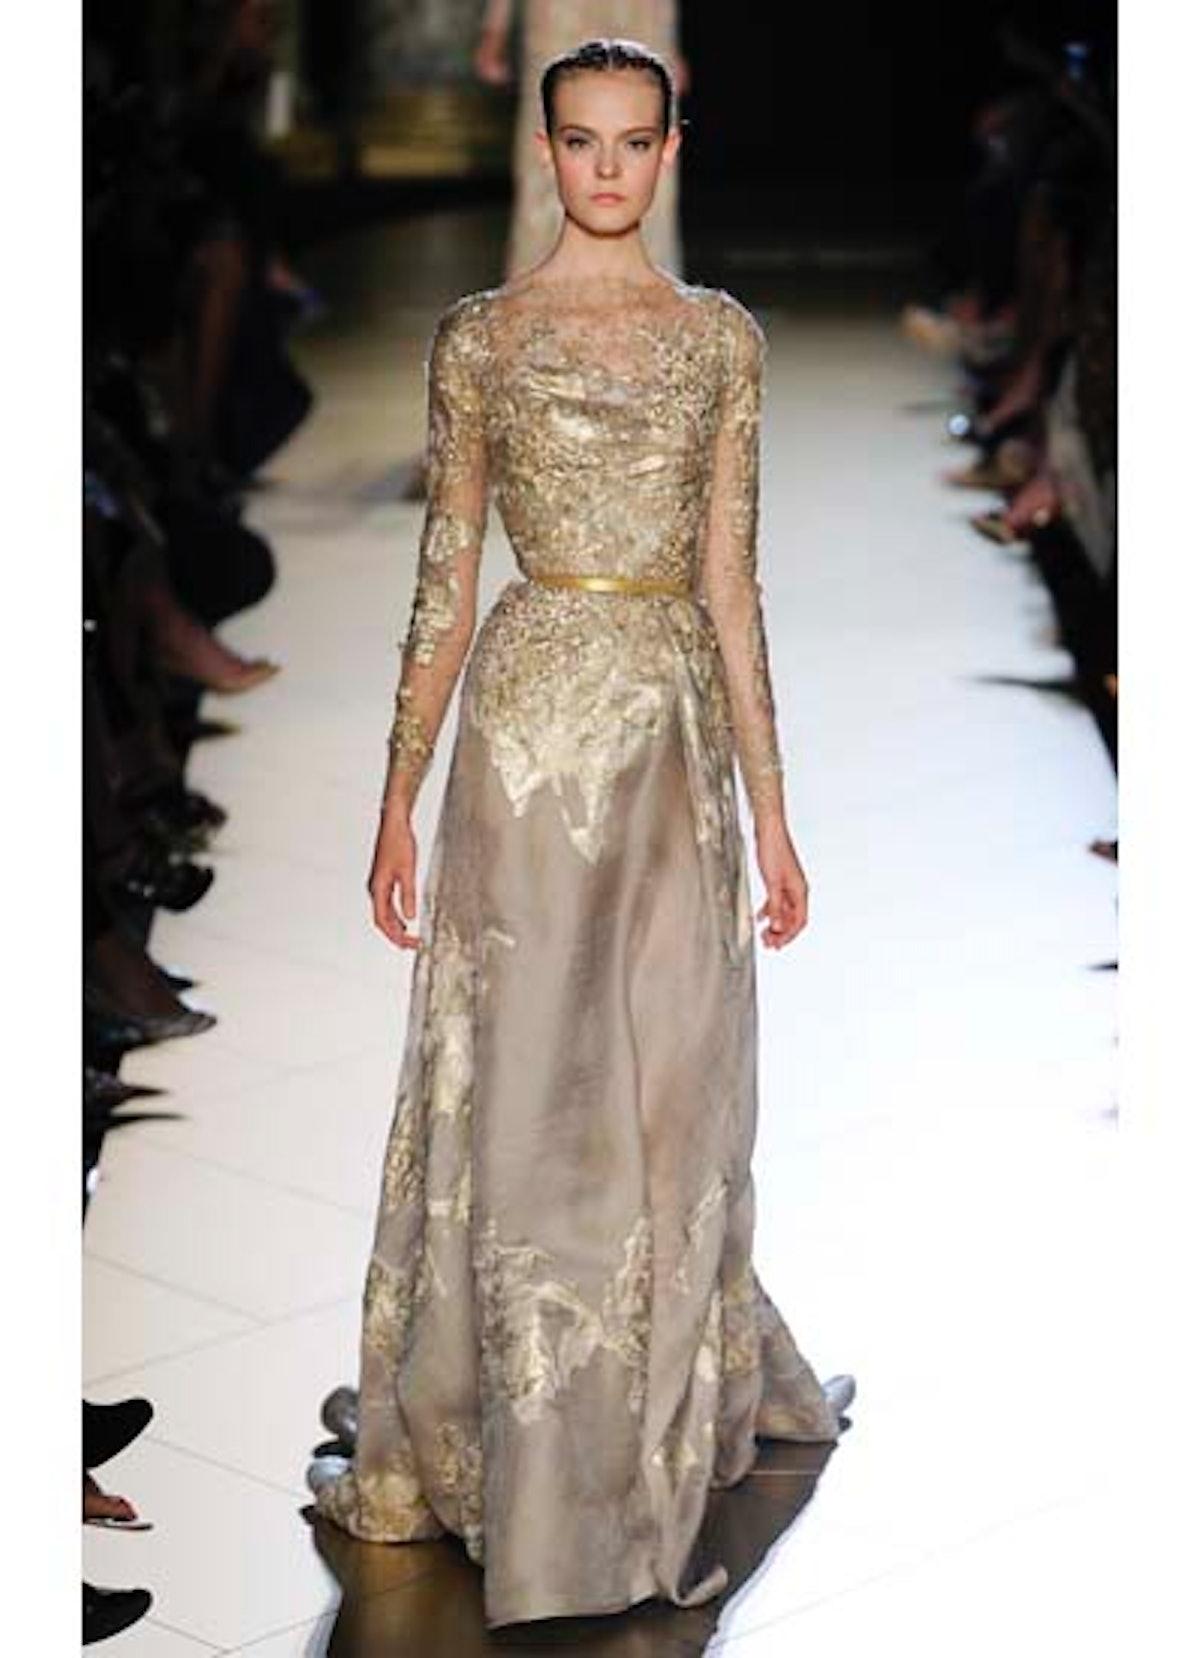 fass-elie-saab-couture-2012-runway-40-v.jpg